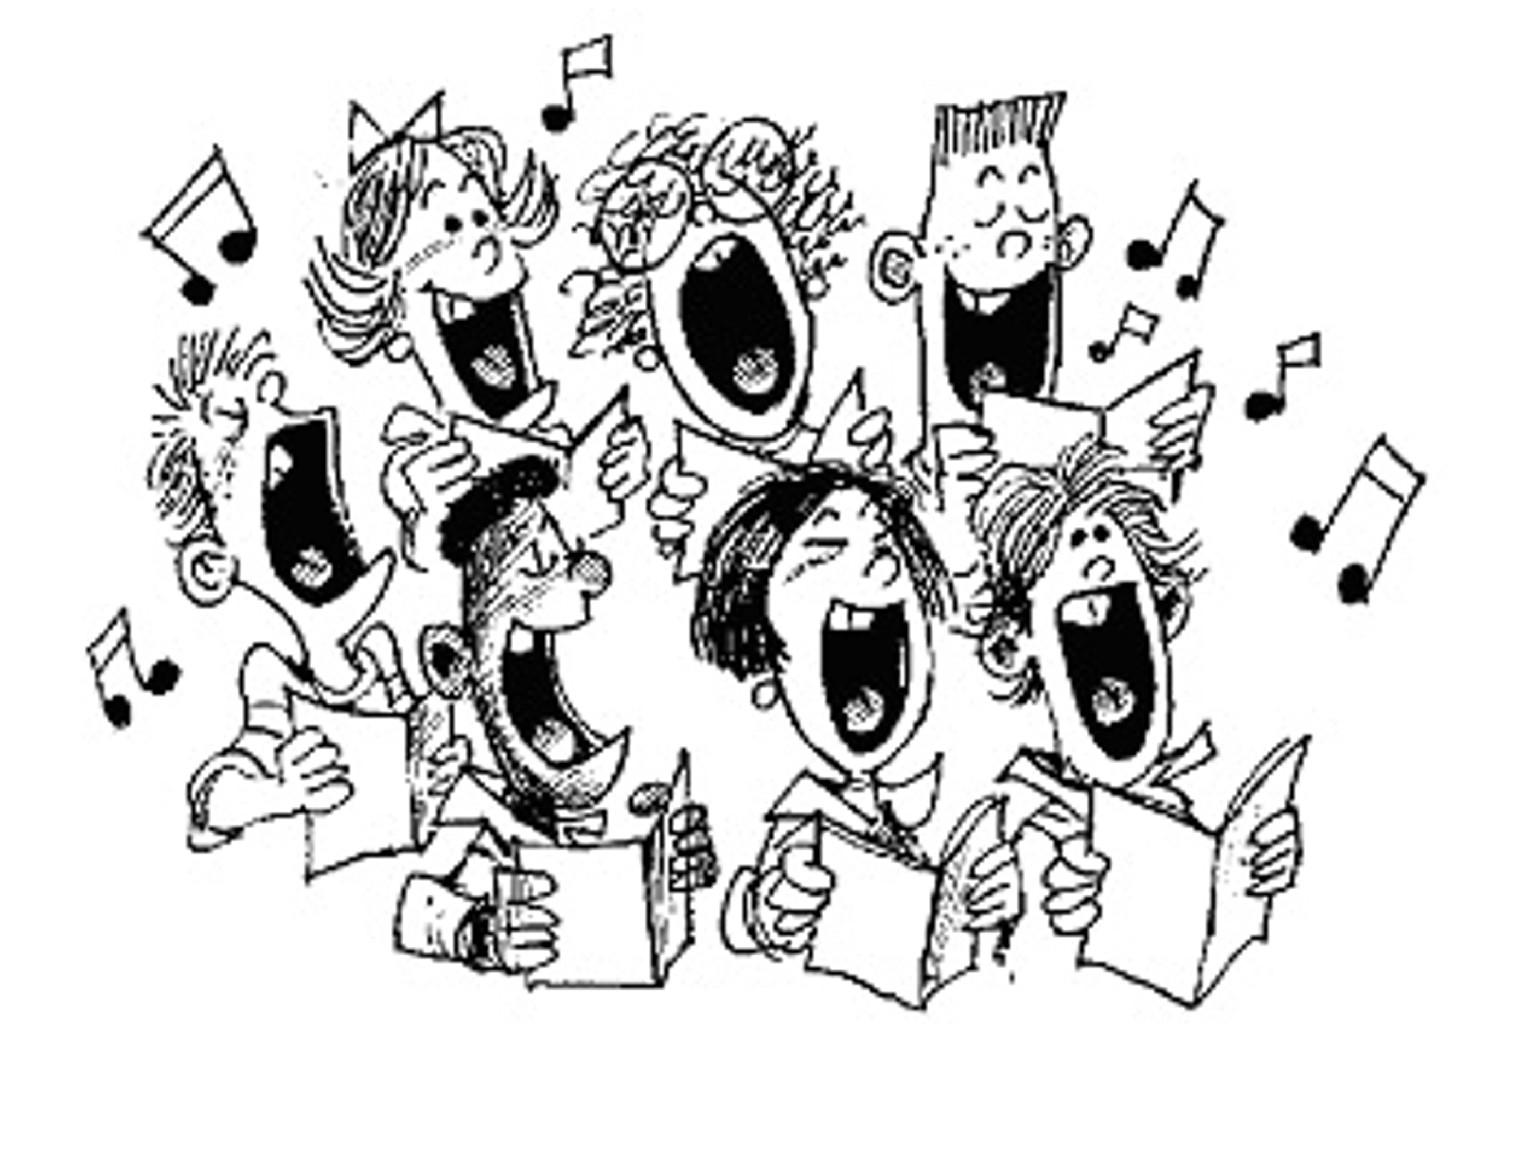 Ms. Rempel's Music Blog: September's Season of Song